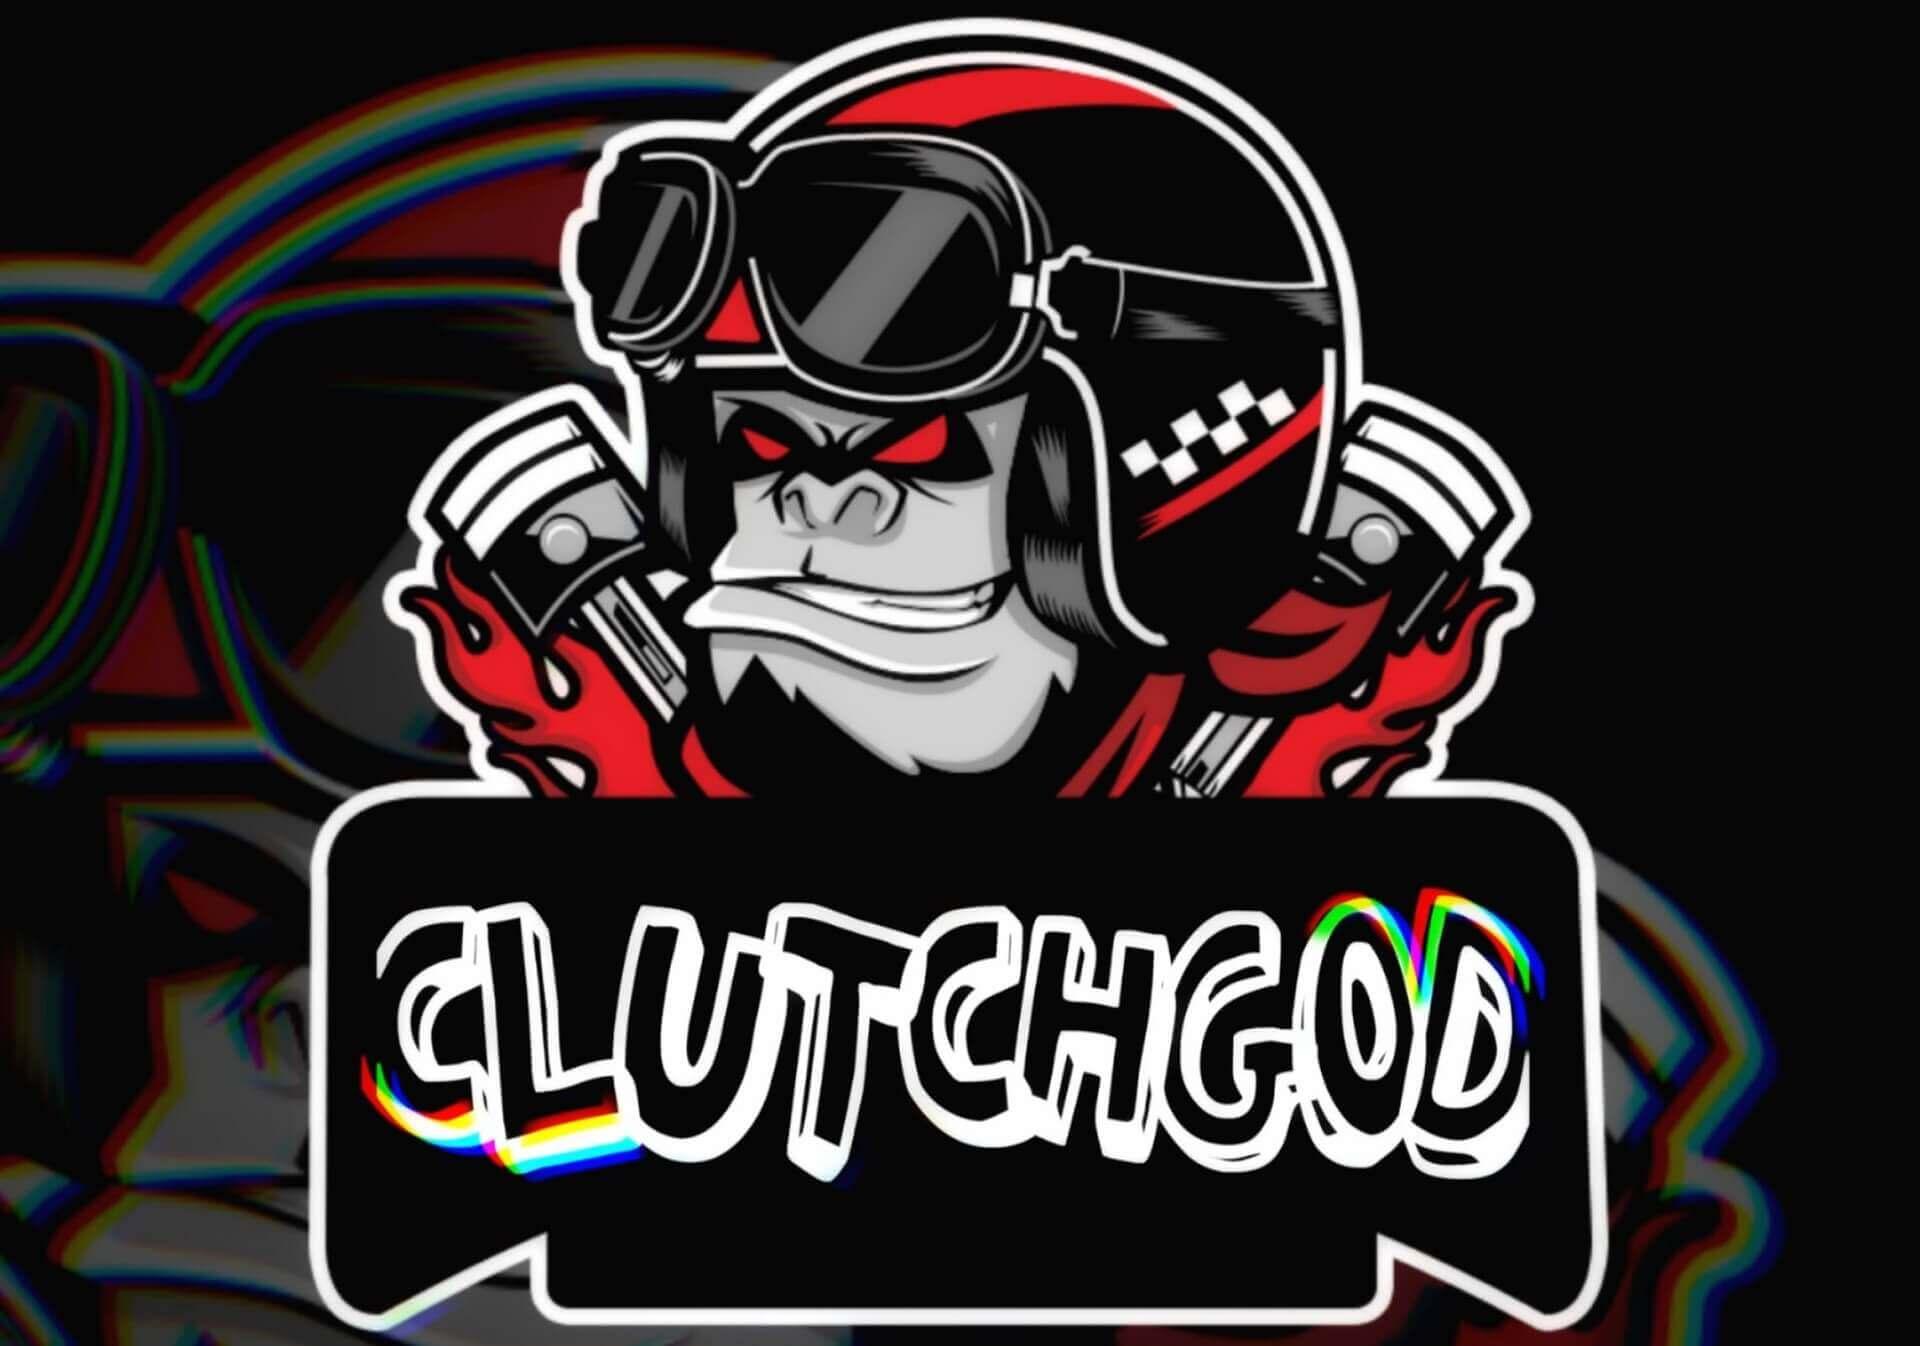 ClutchGod custom cartoon or mascot logo for esports sports pubg HD wallpaper